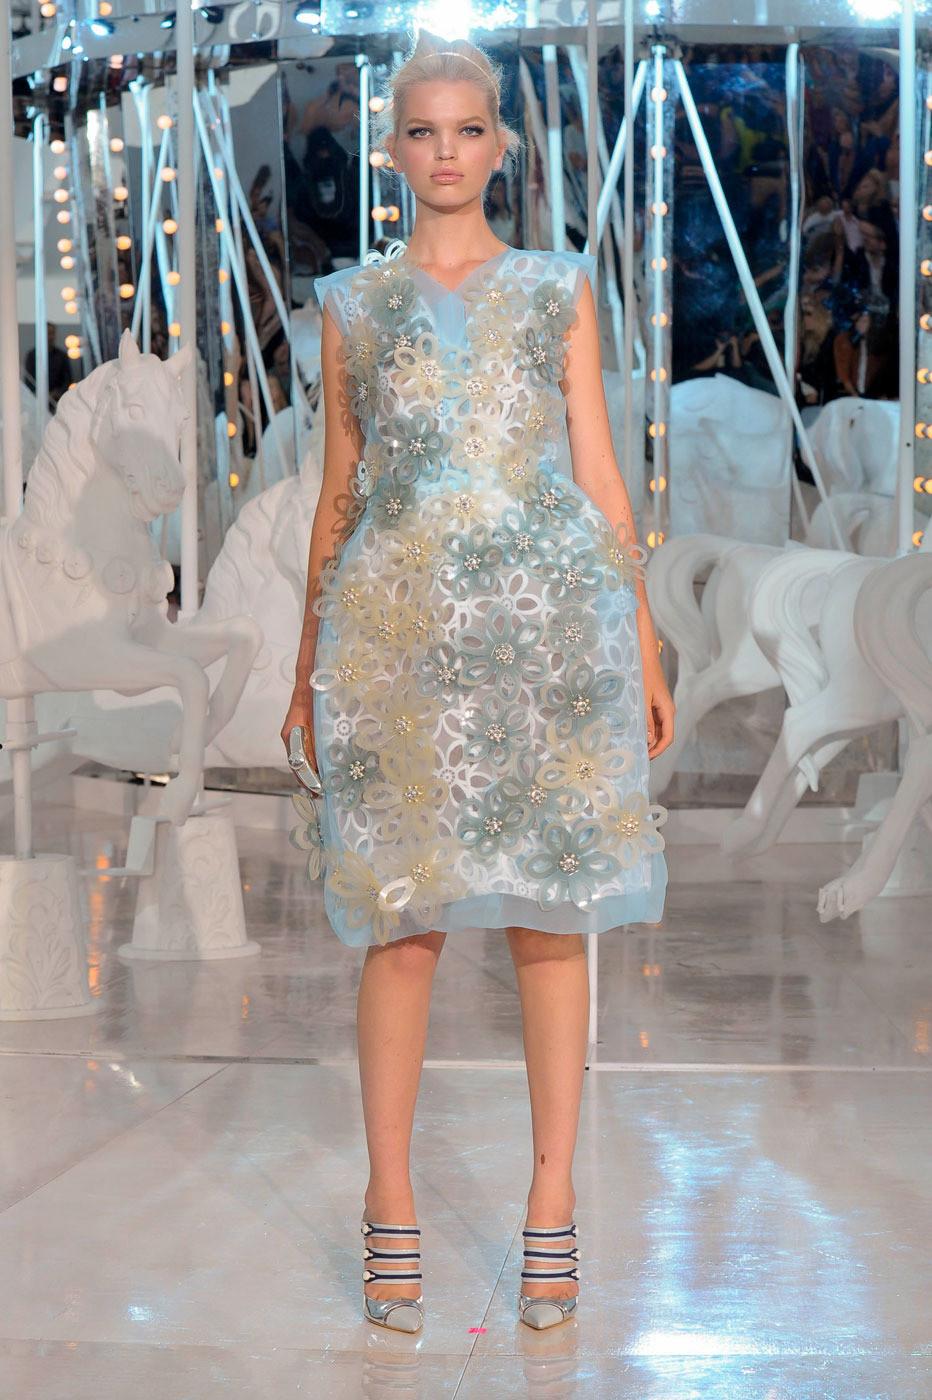 Louis Vuitton Spring 2012 u K 2 OQAH 4 qpgx - 932 x 1400  289kb  jpg